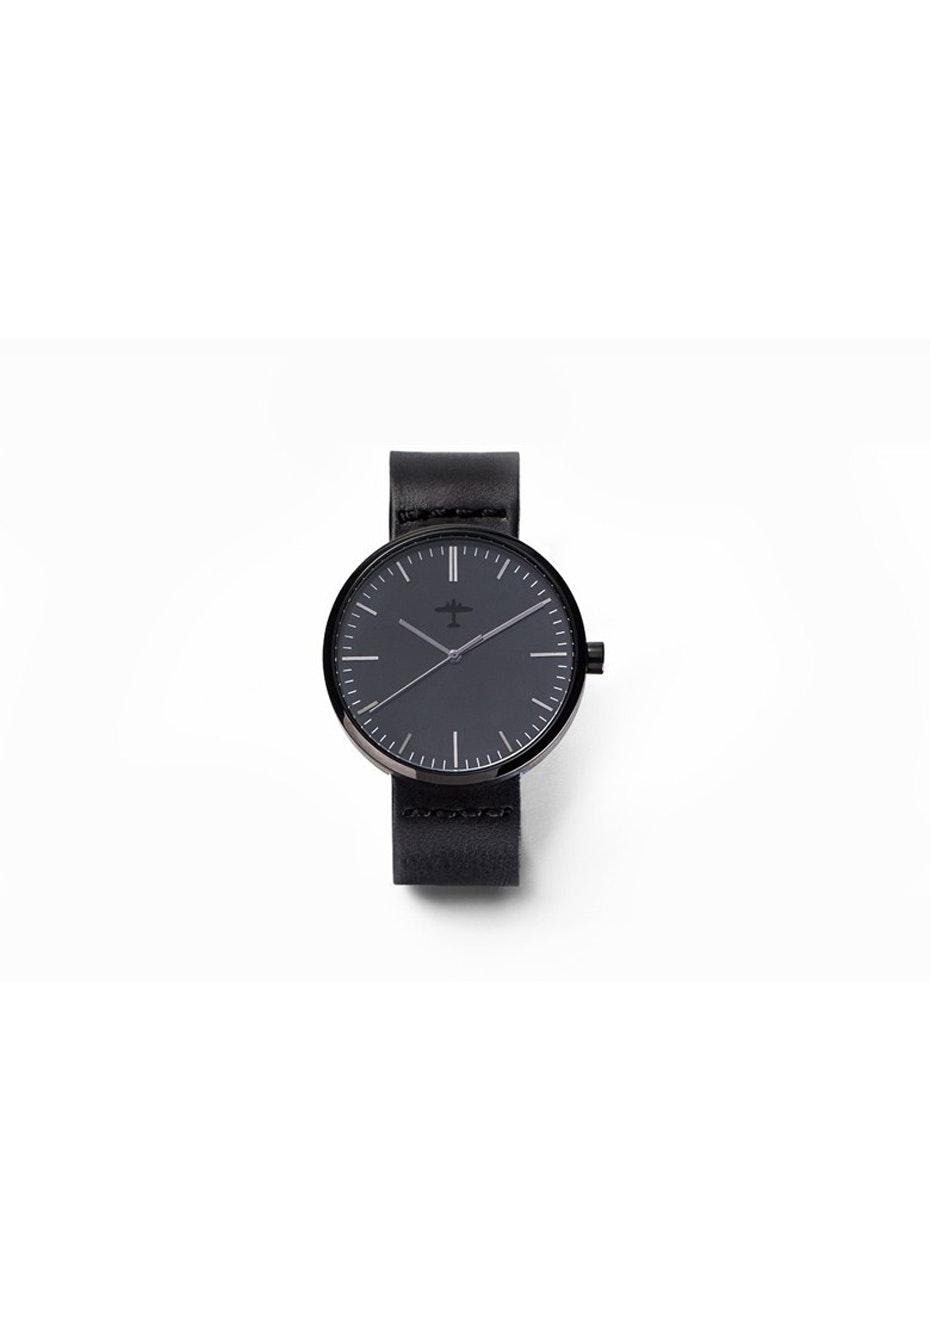 Under The Sun - 60Sq - Black + Black Leather